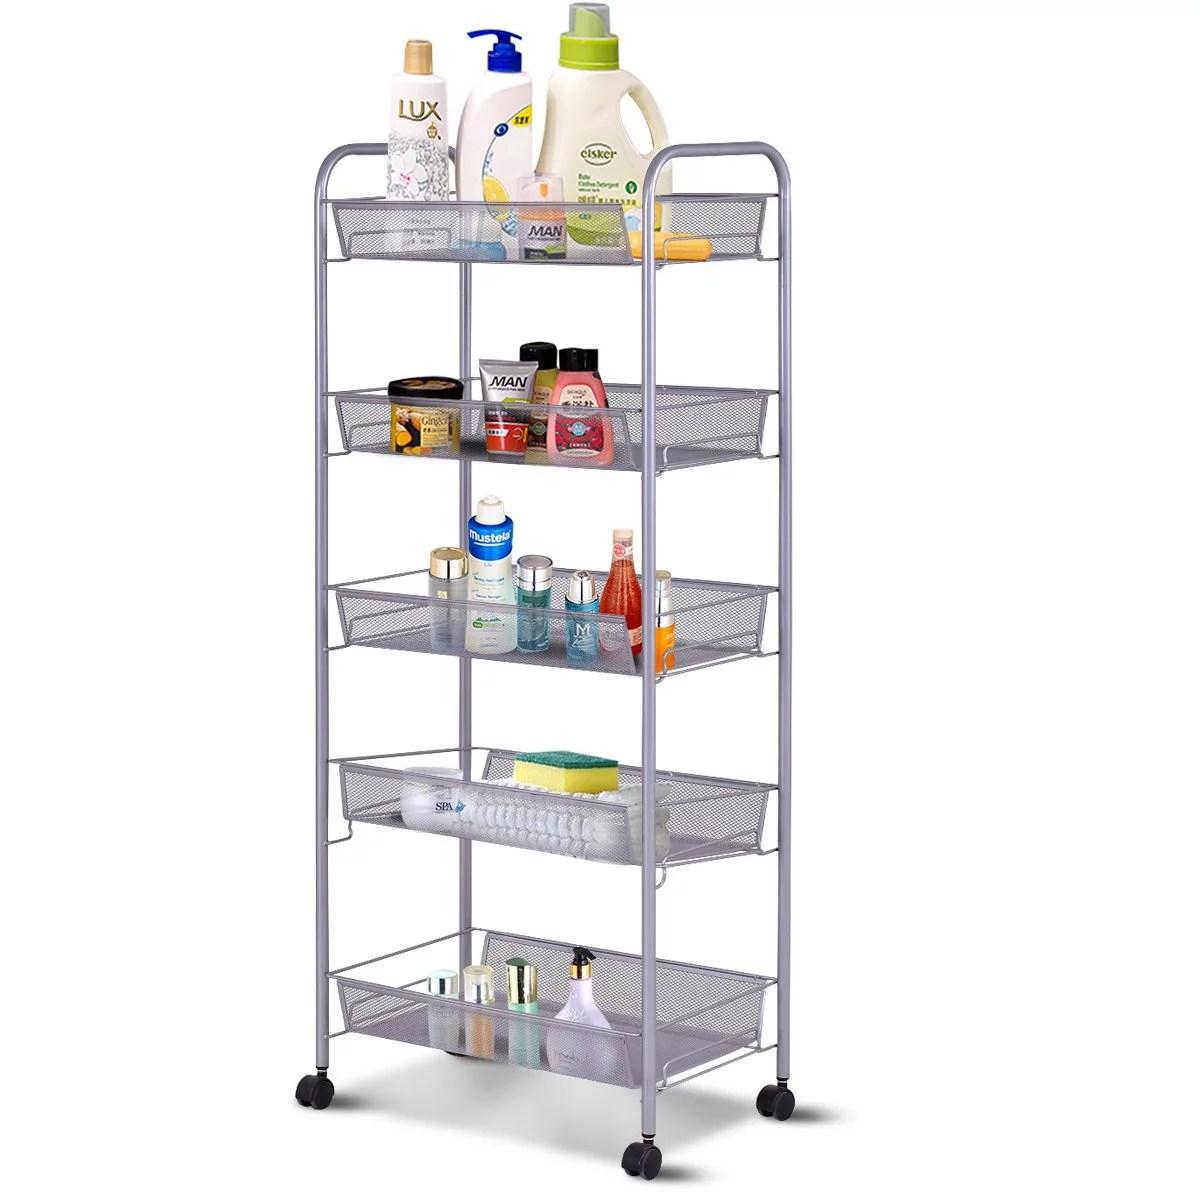 zimtown 5 tier mesh shelving rack shelf kitchen pantry storage rolling utility cart walmart com